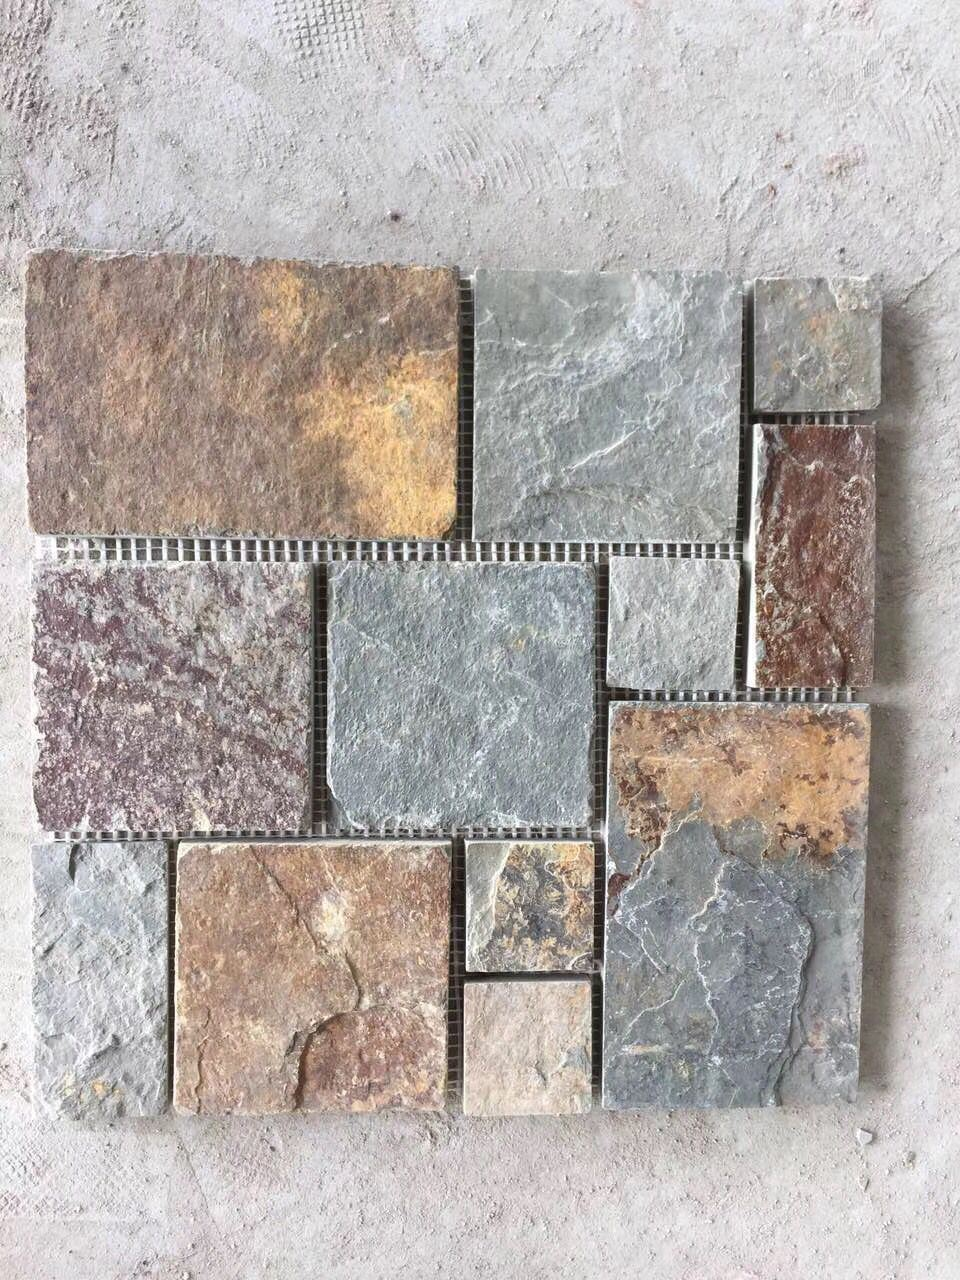 - China Slate/Ceramic/Porcelain/Glass Tumbled Marble Mosaic Tiles